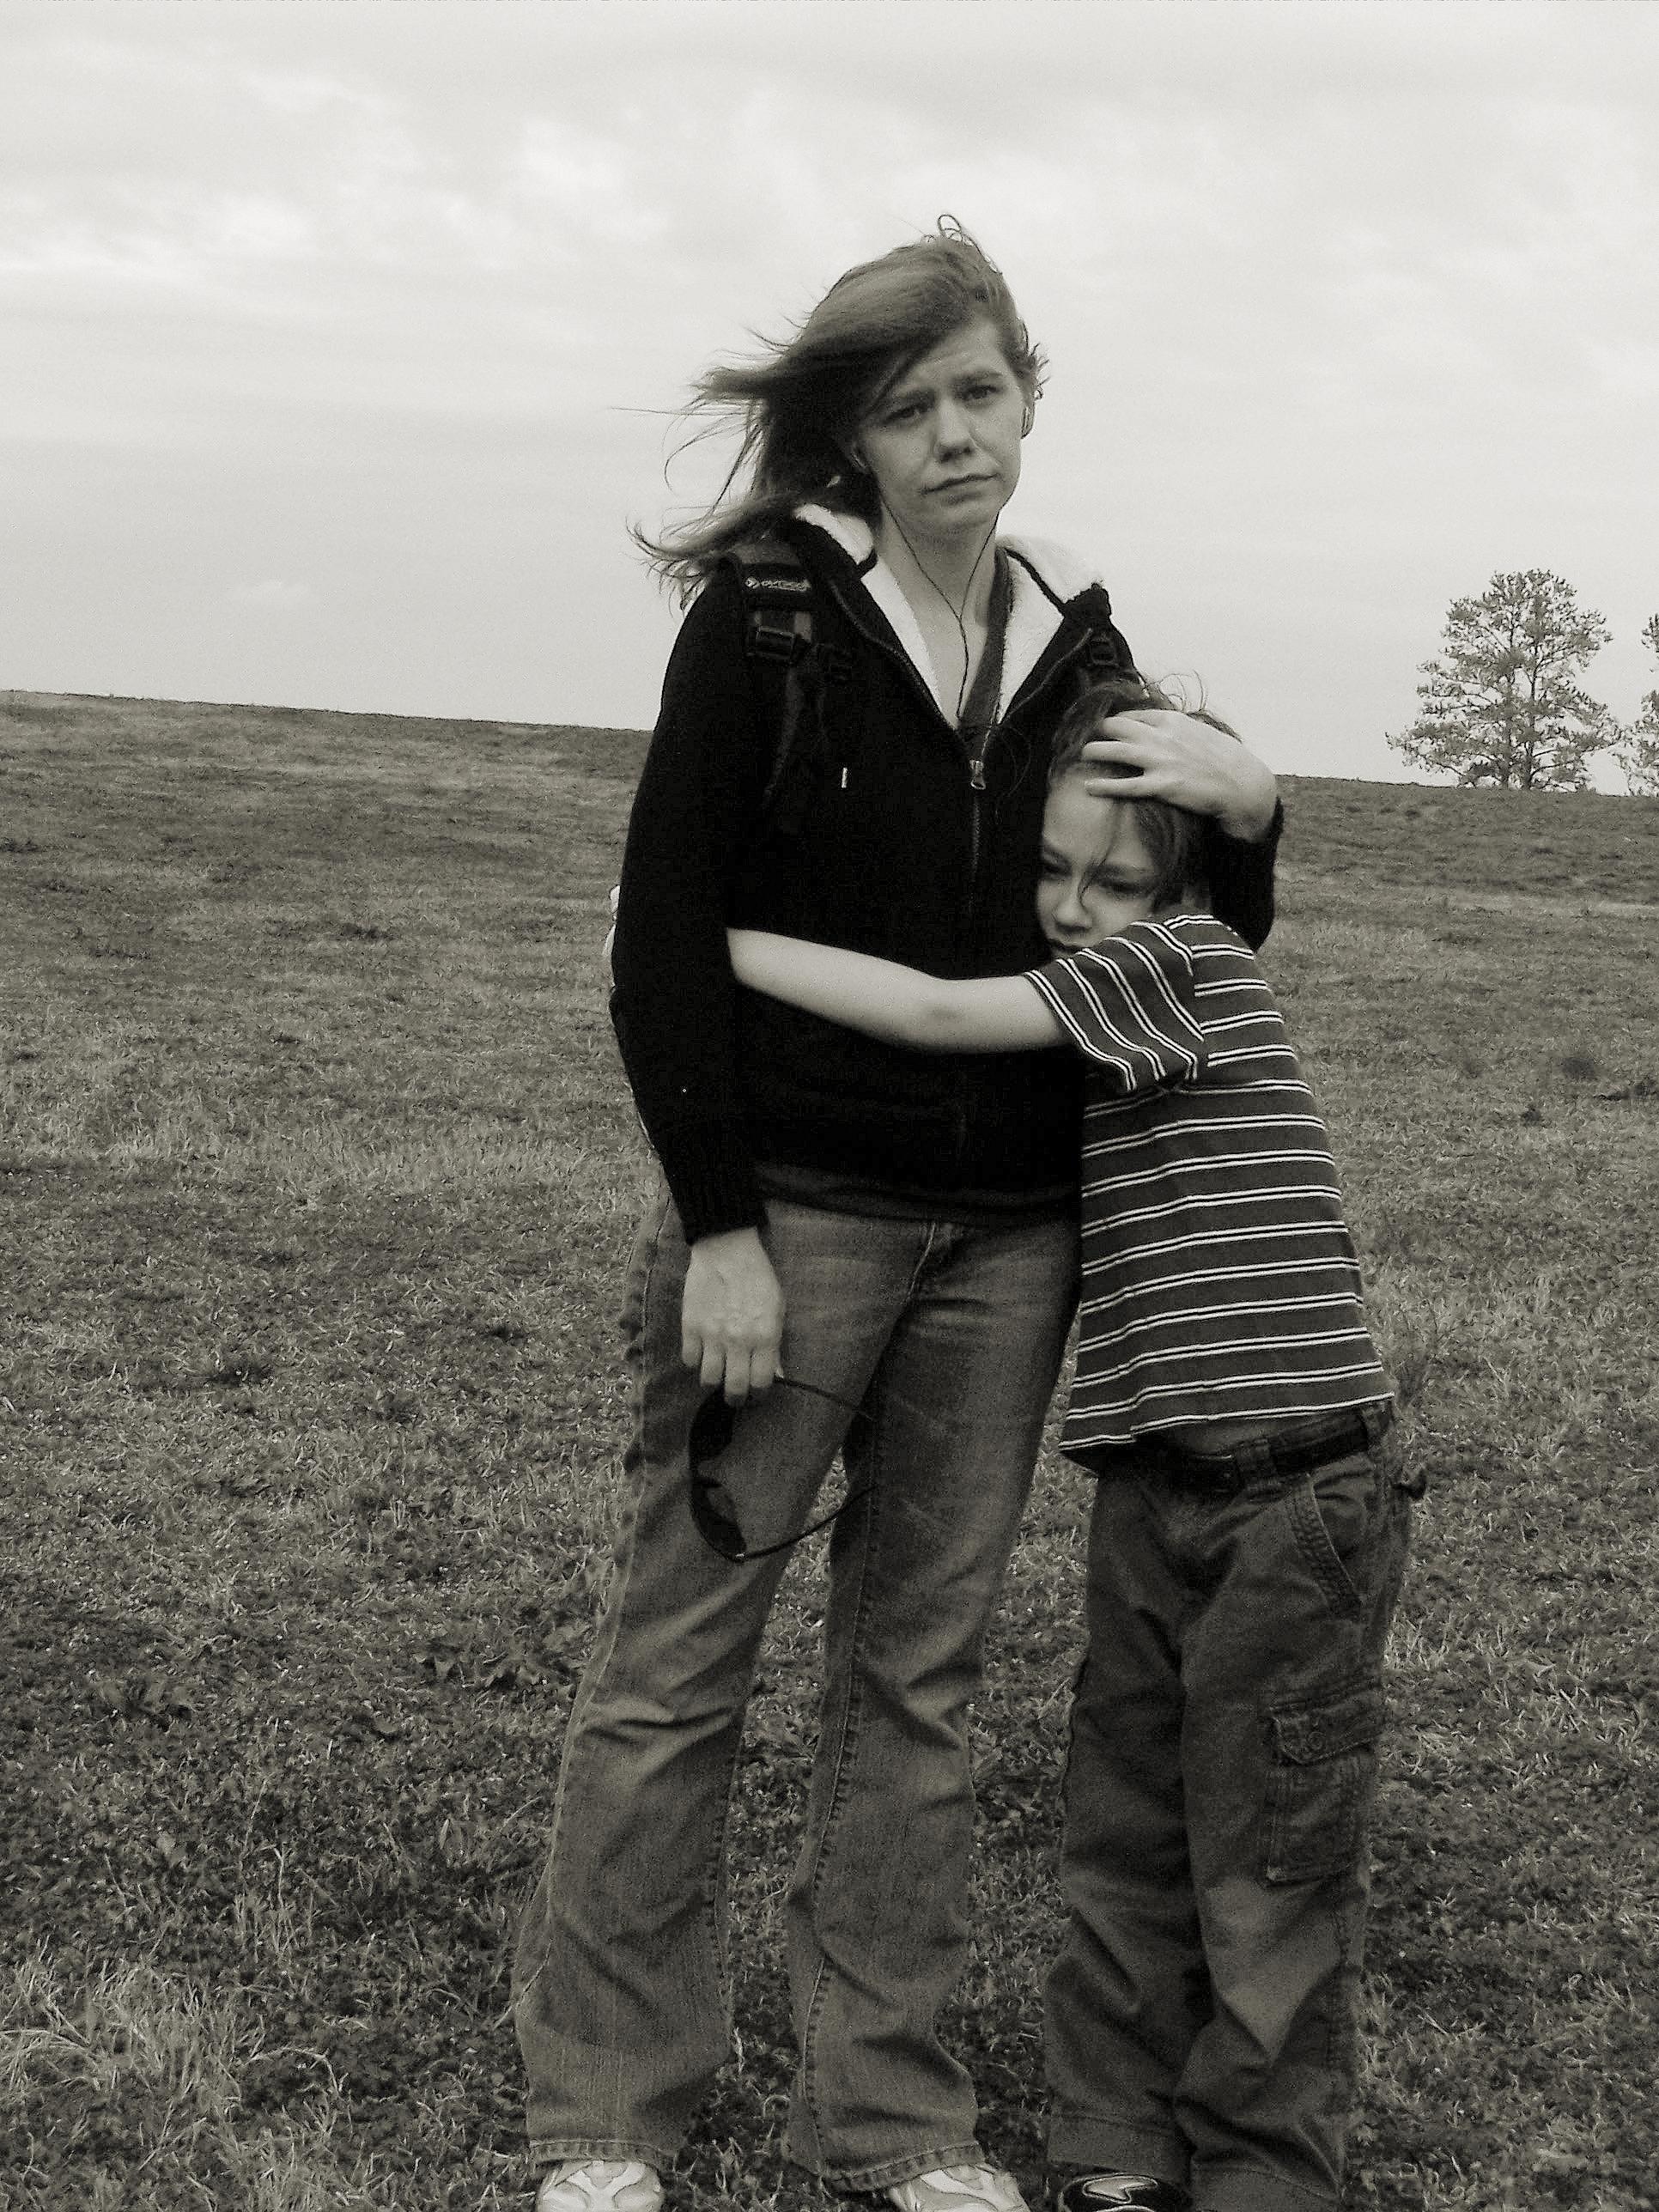 Me & My Crazy Horse